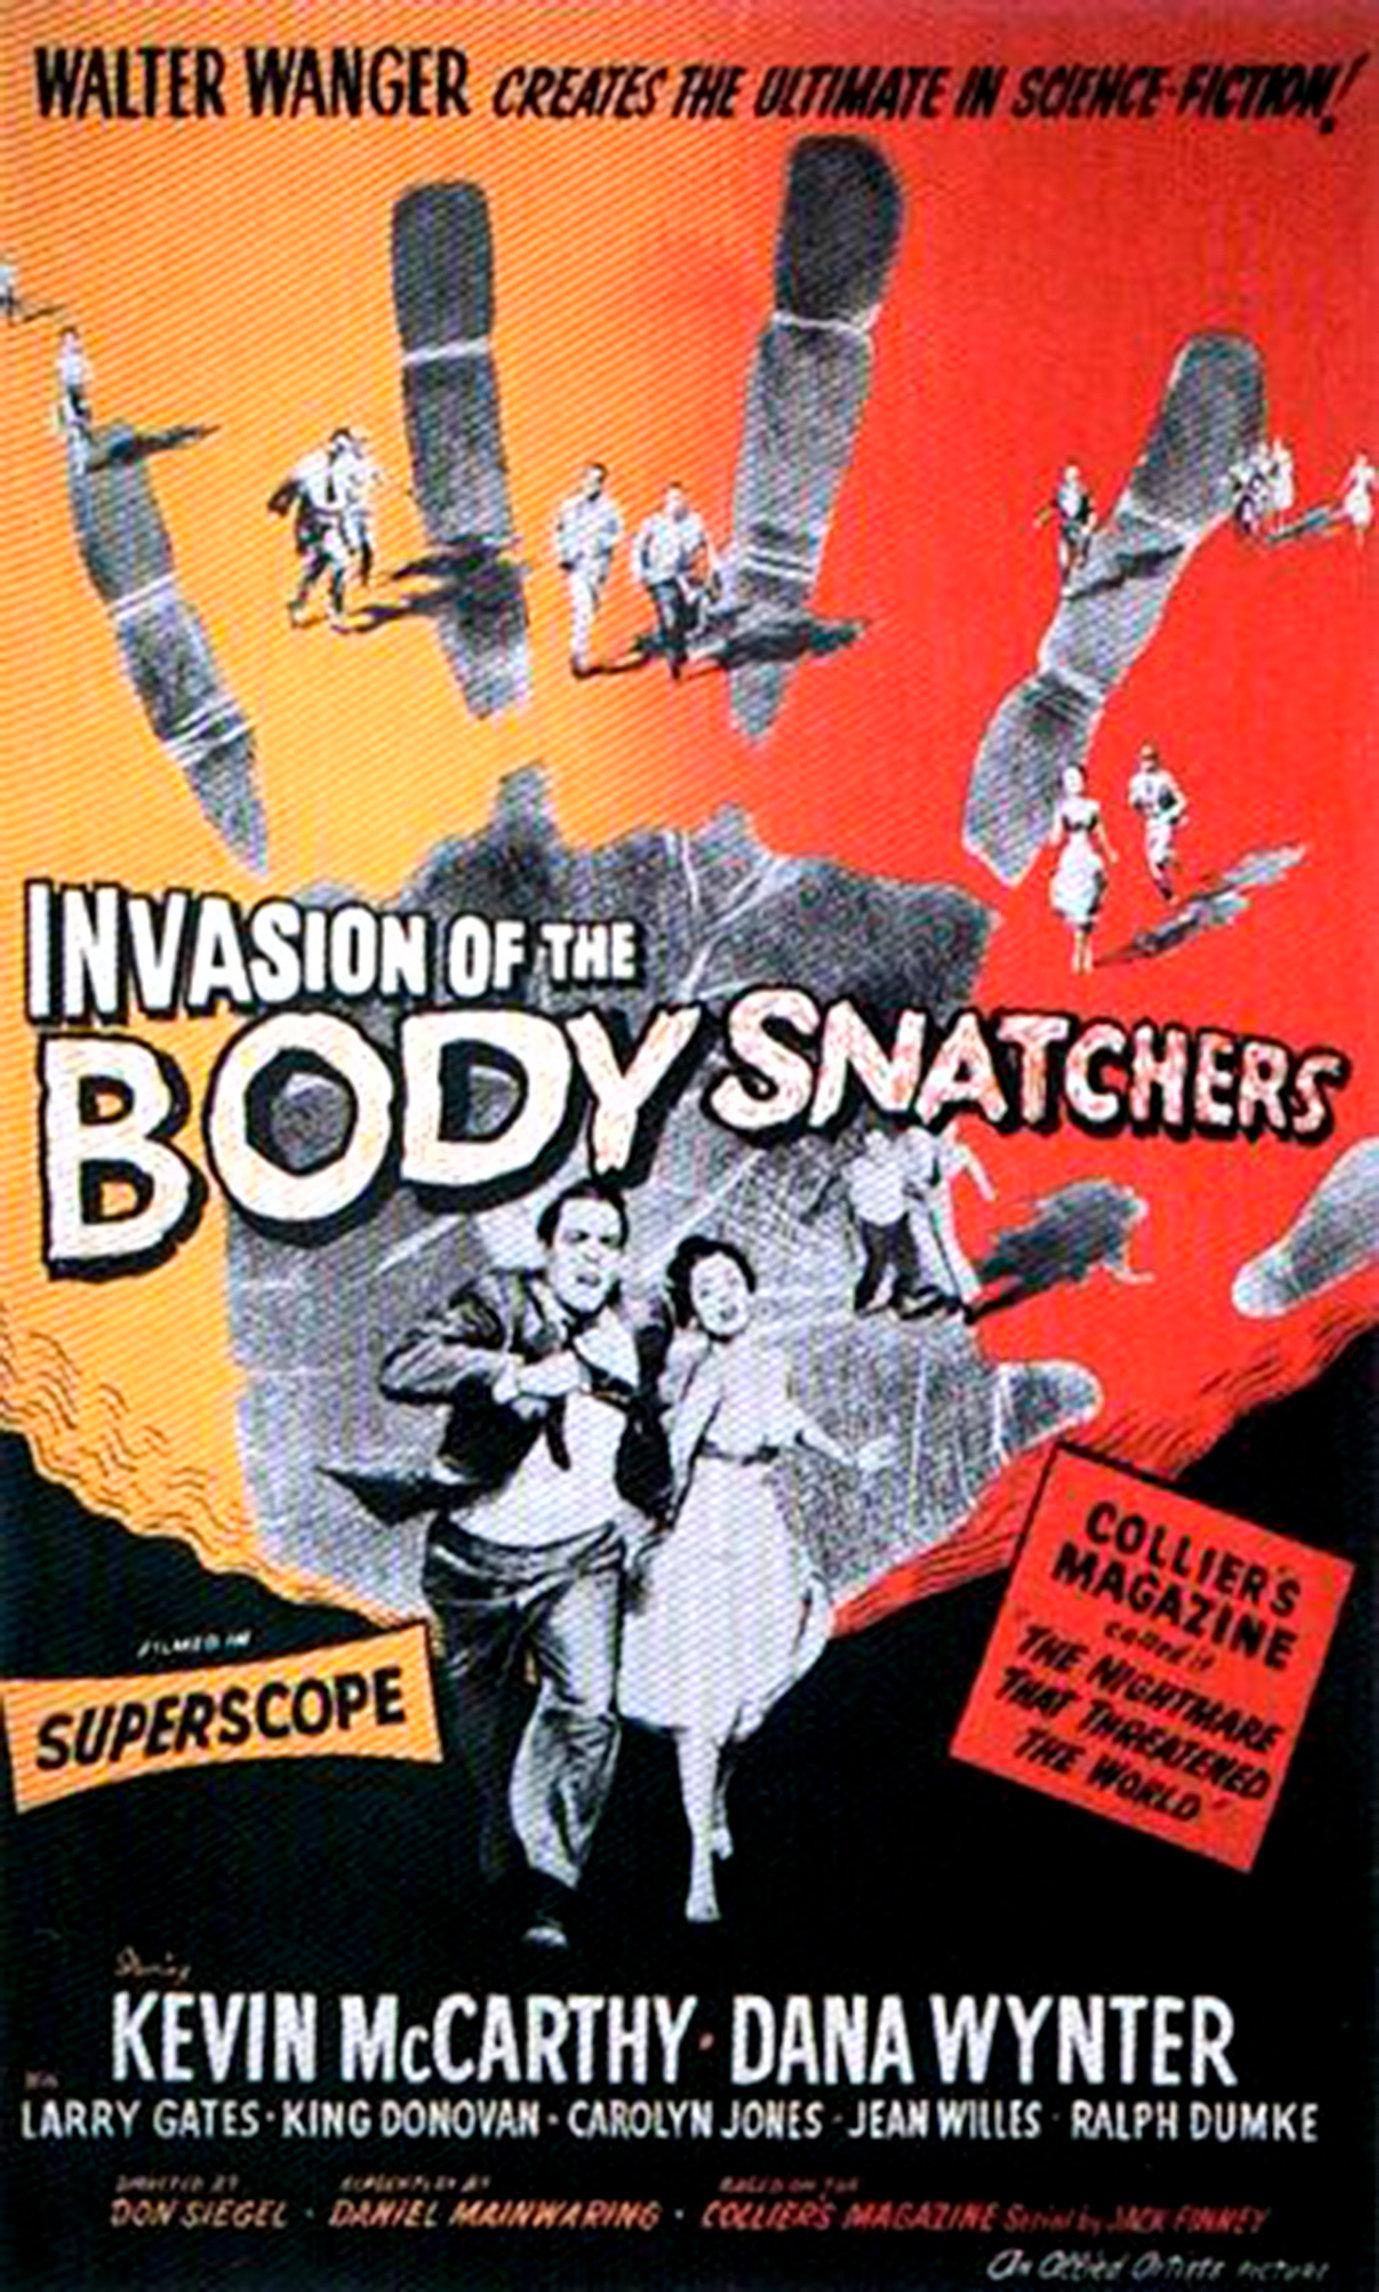 De Body Snatchers